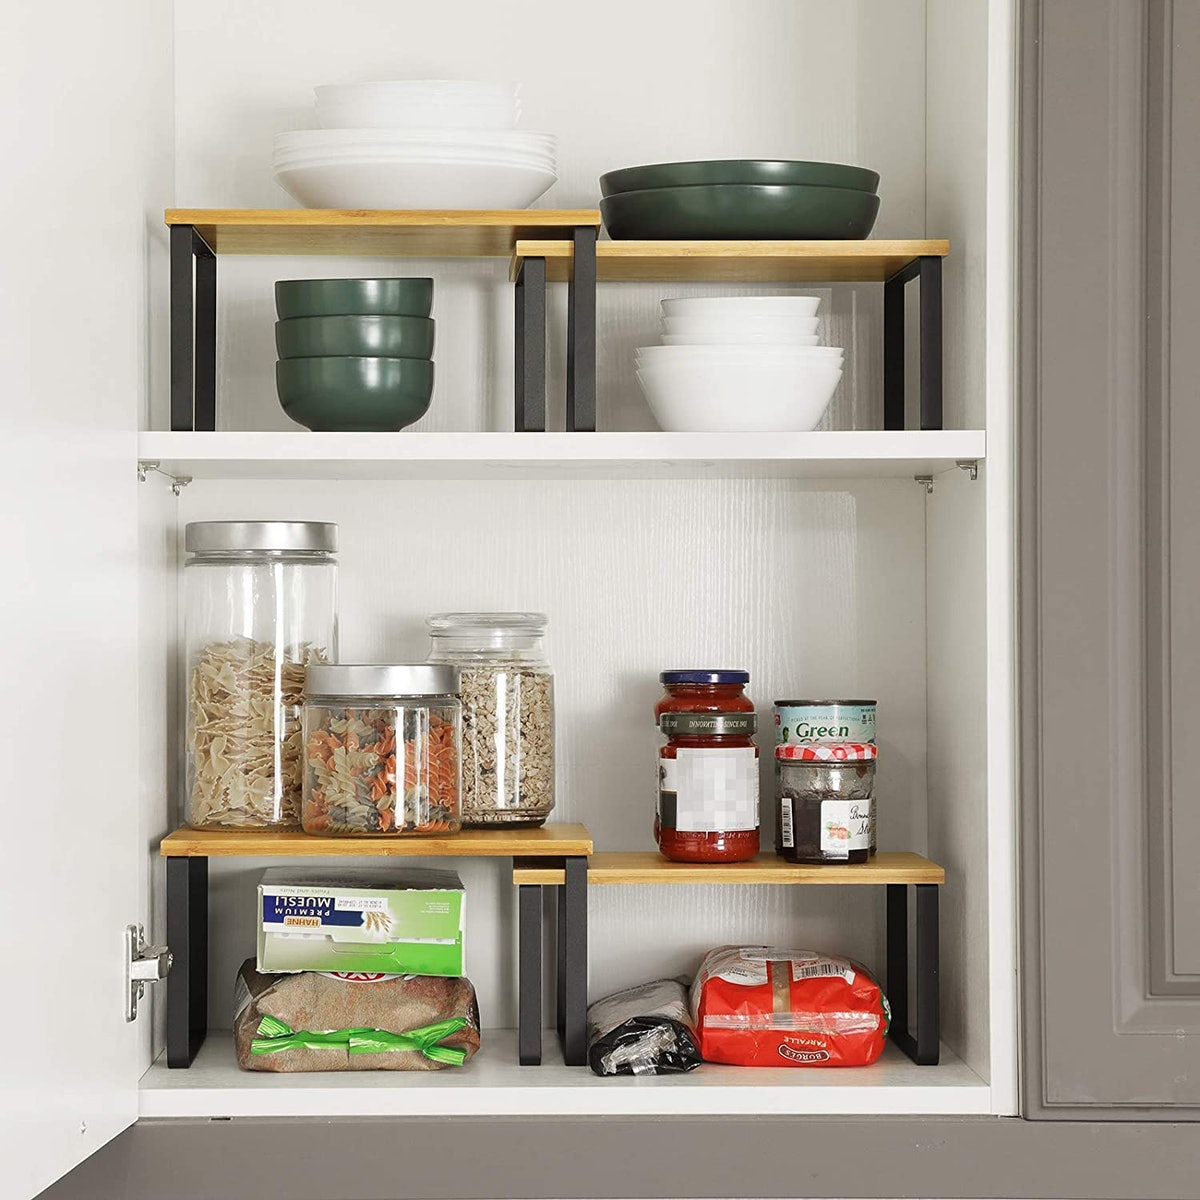 SONGMICS Cabinet Shelf Organizers (4-Pack)